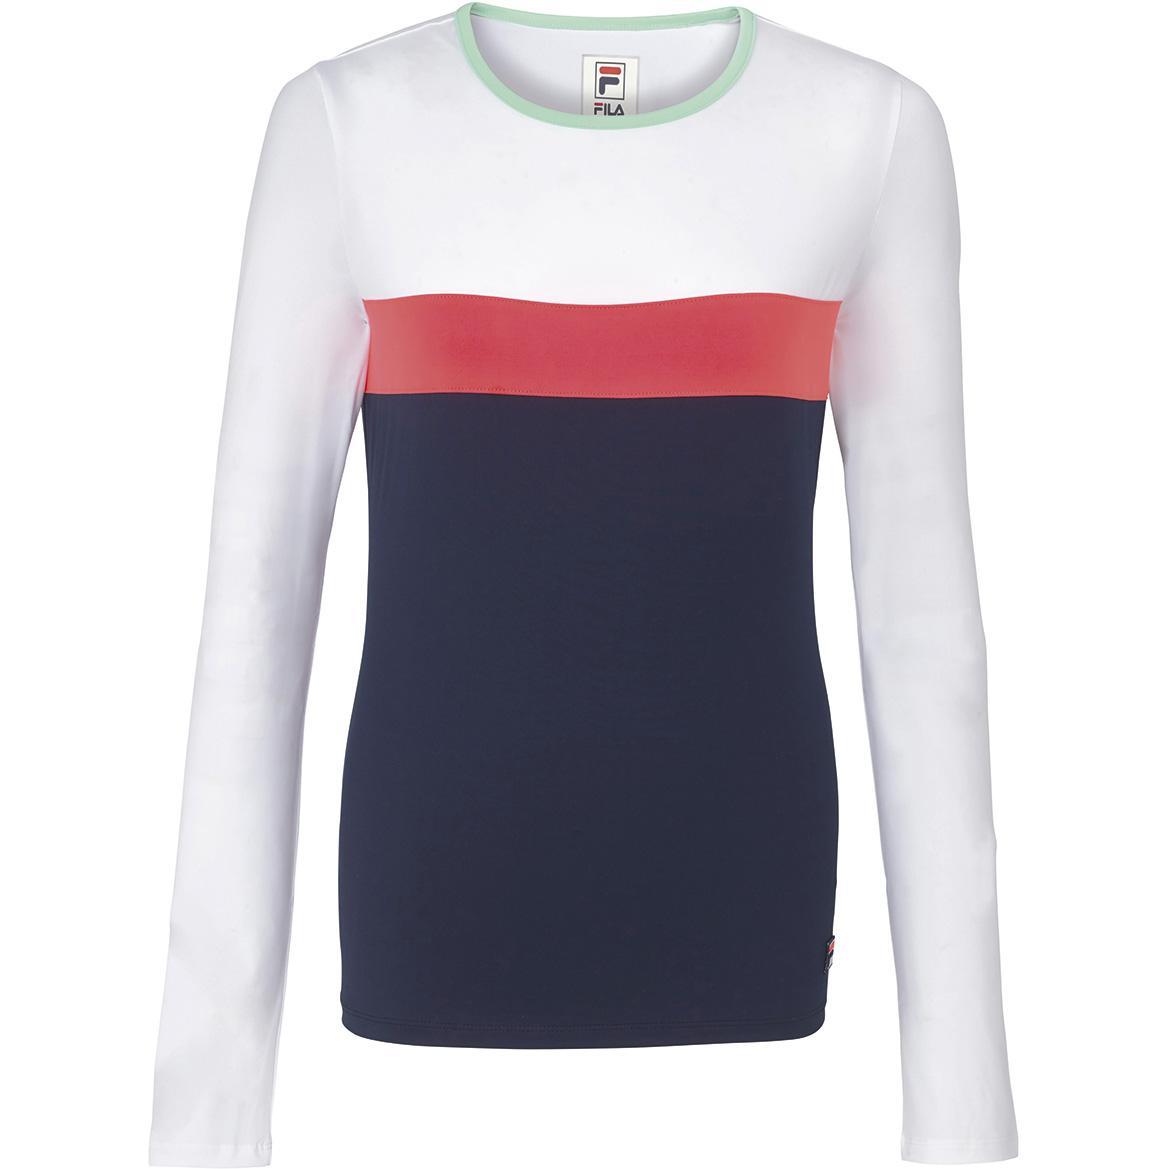 d639a5ec Fila Womens Heritage Long Sleeve Top - White/Diva Pink/Navy - Tennisnuts.com